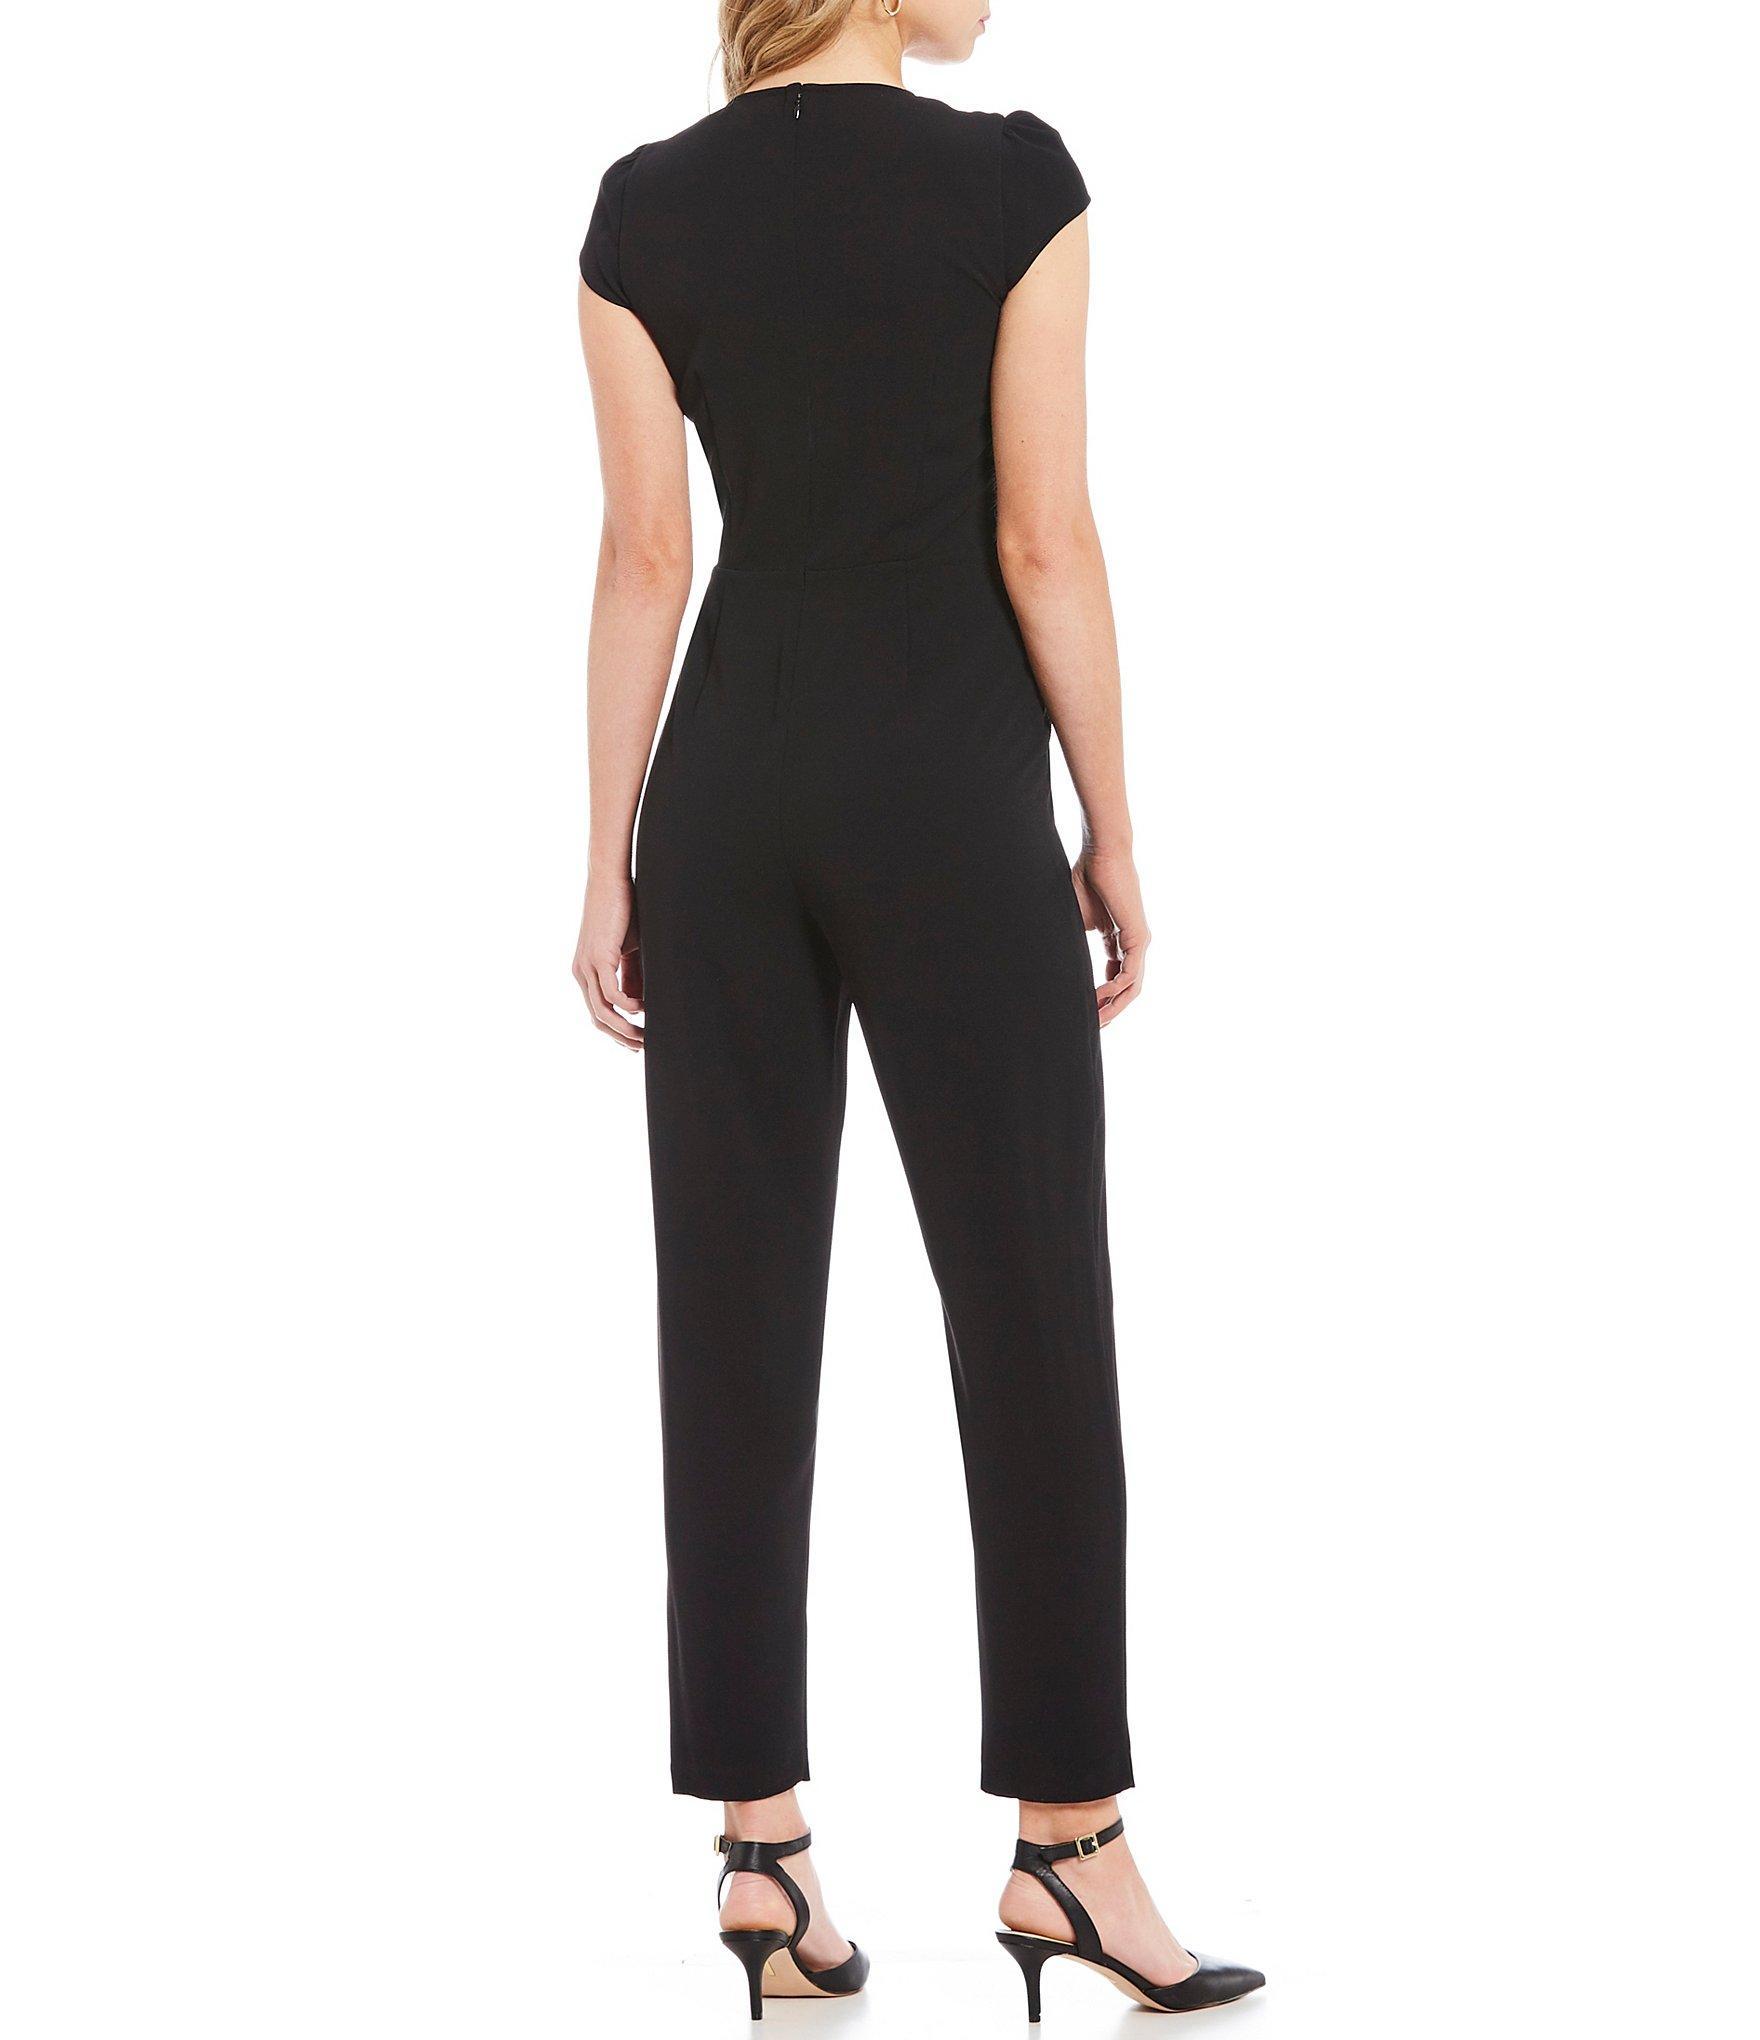 ed14e147e3f6 Lyst - Cece Moss Crepe Cap Sleeve V-neck Bow Waist Jumpsuit in Black